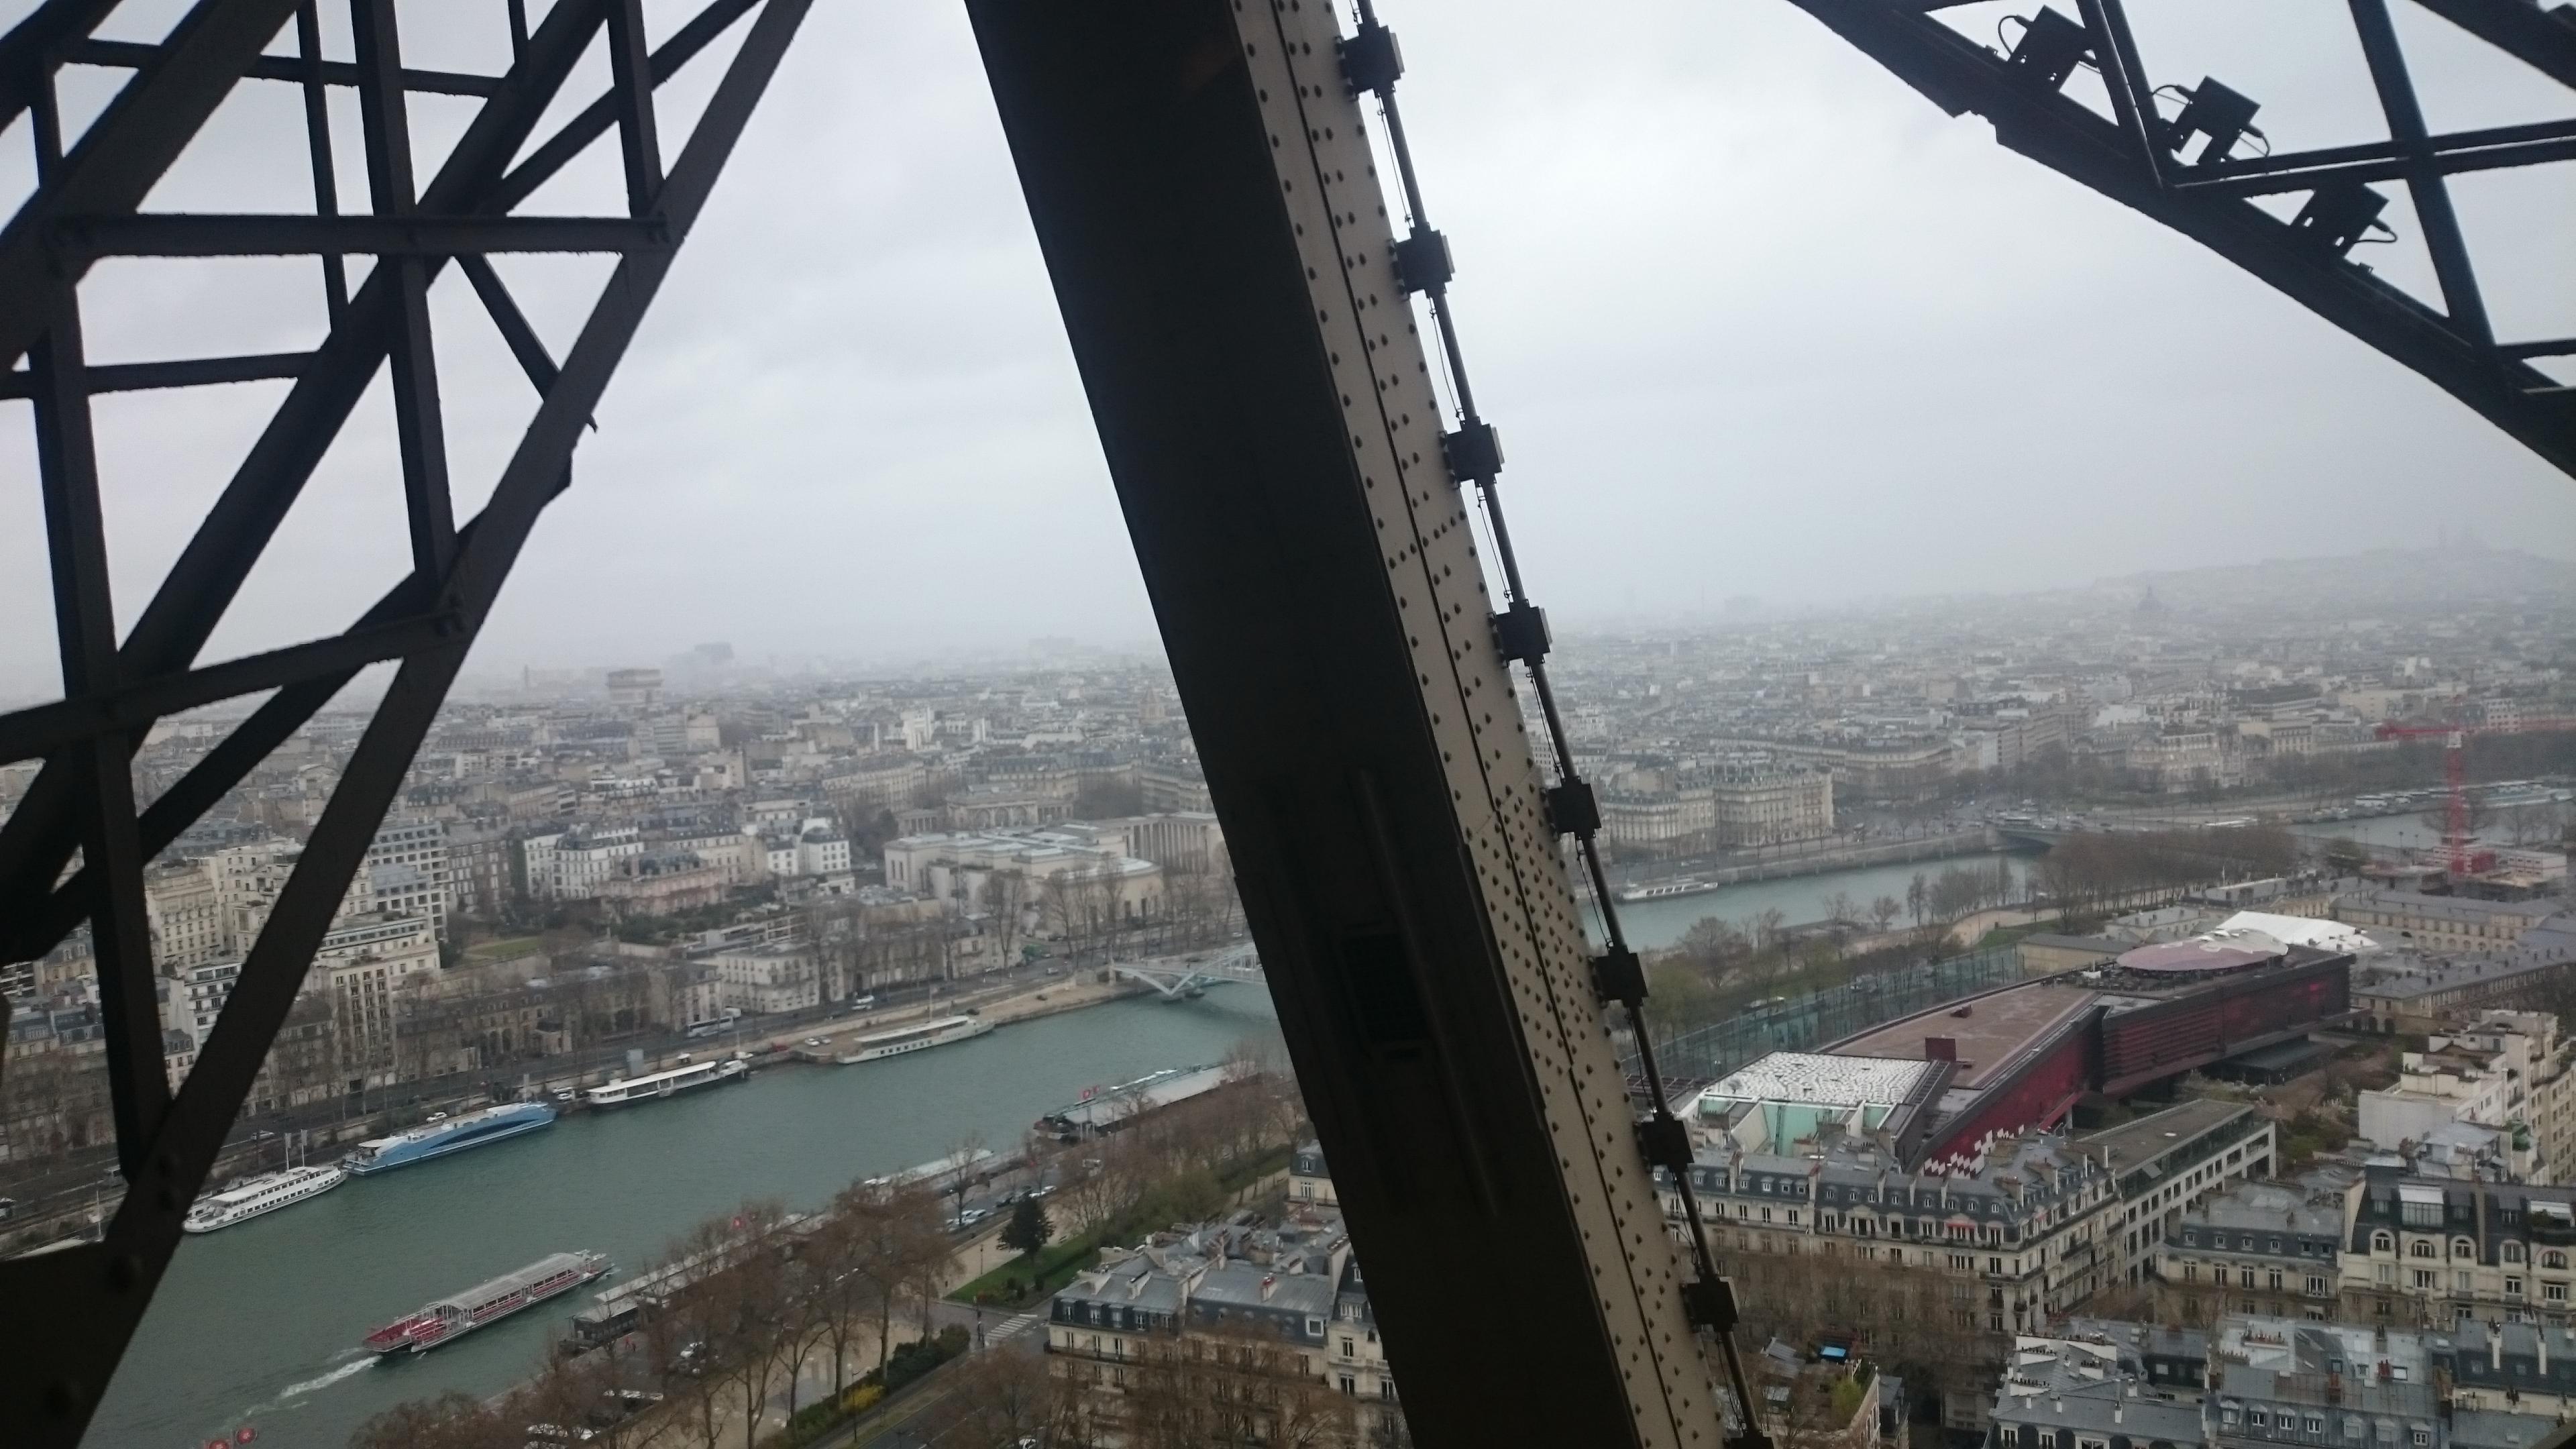 DSC 1905 - Visitando la Torre Eiffel en Paris